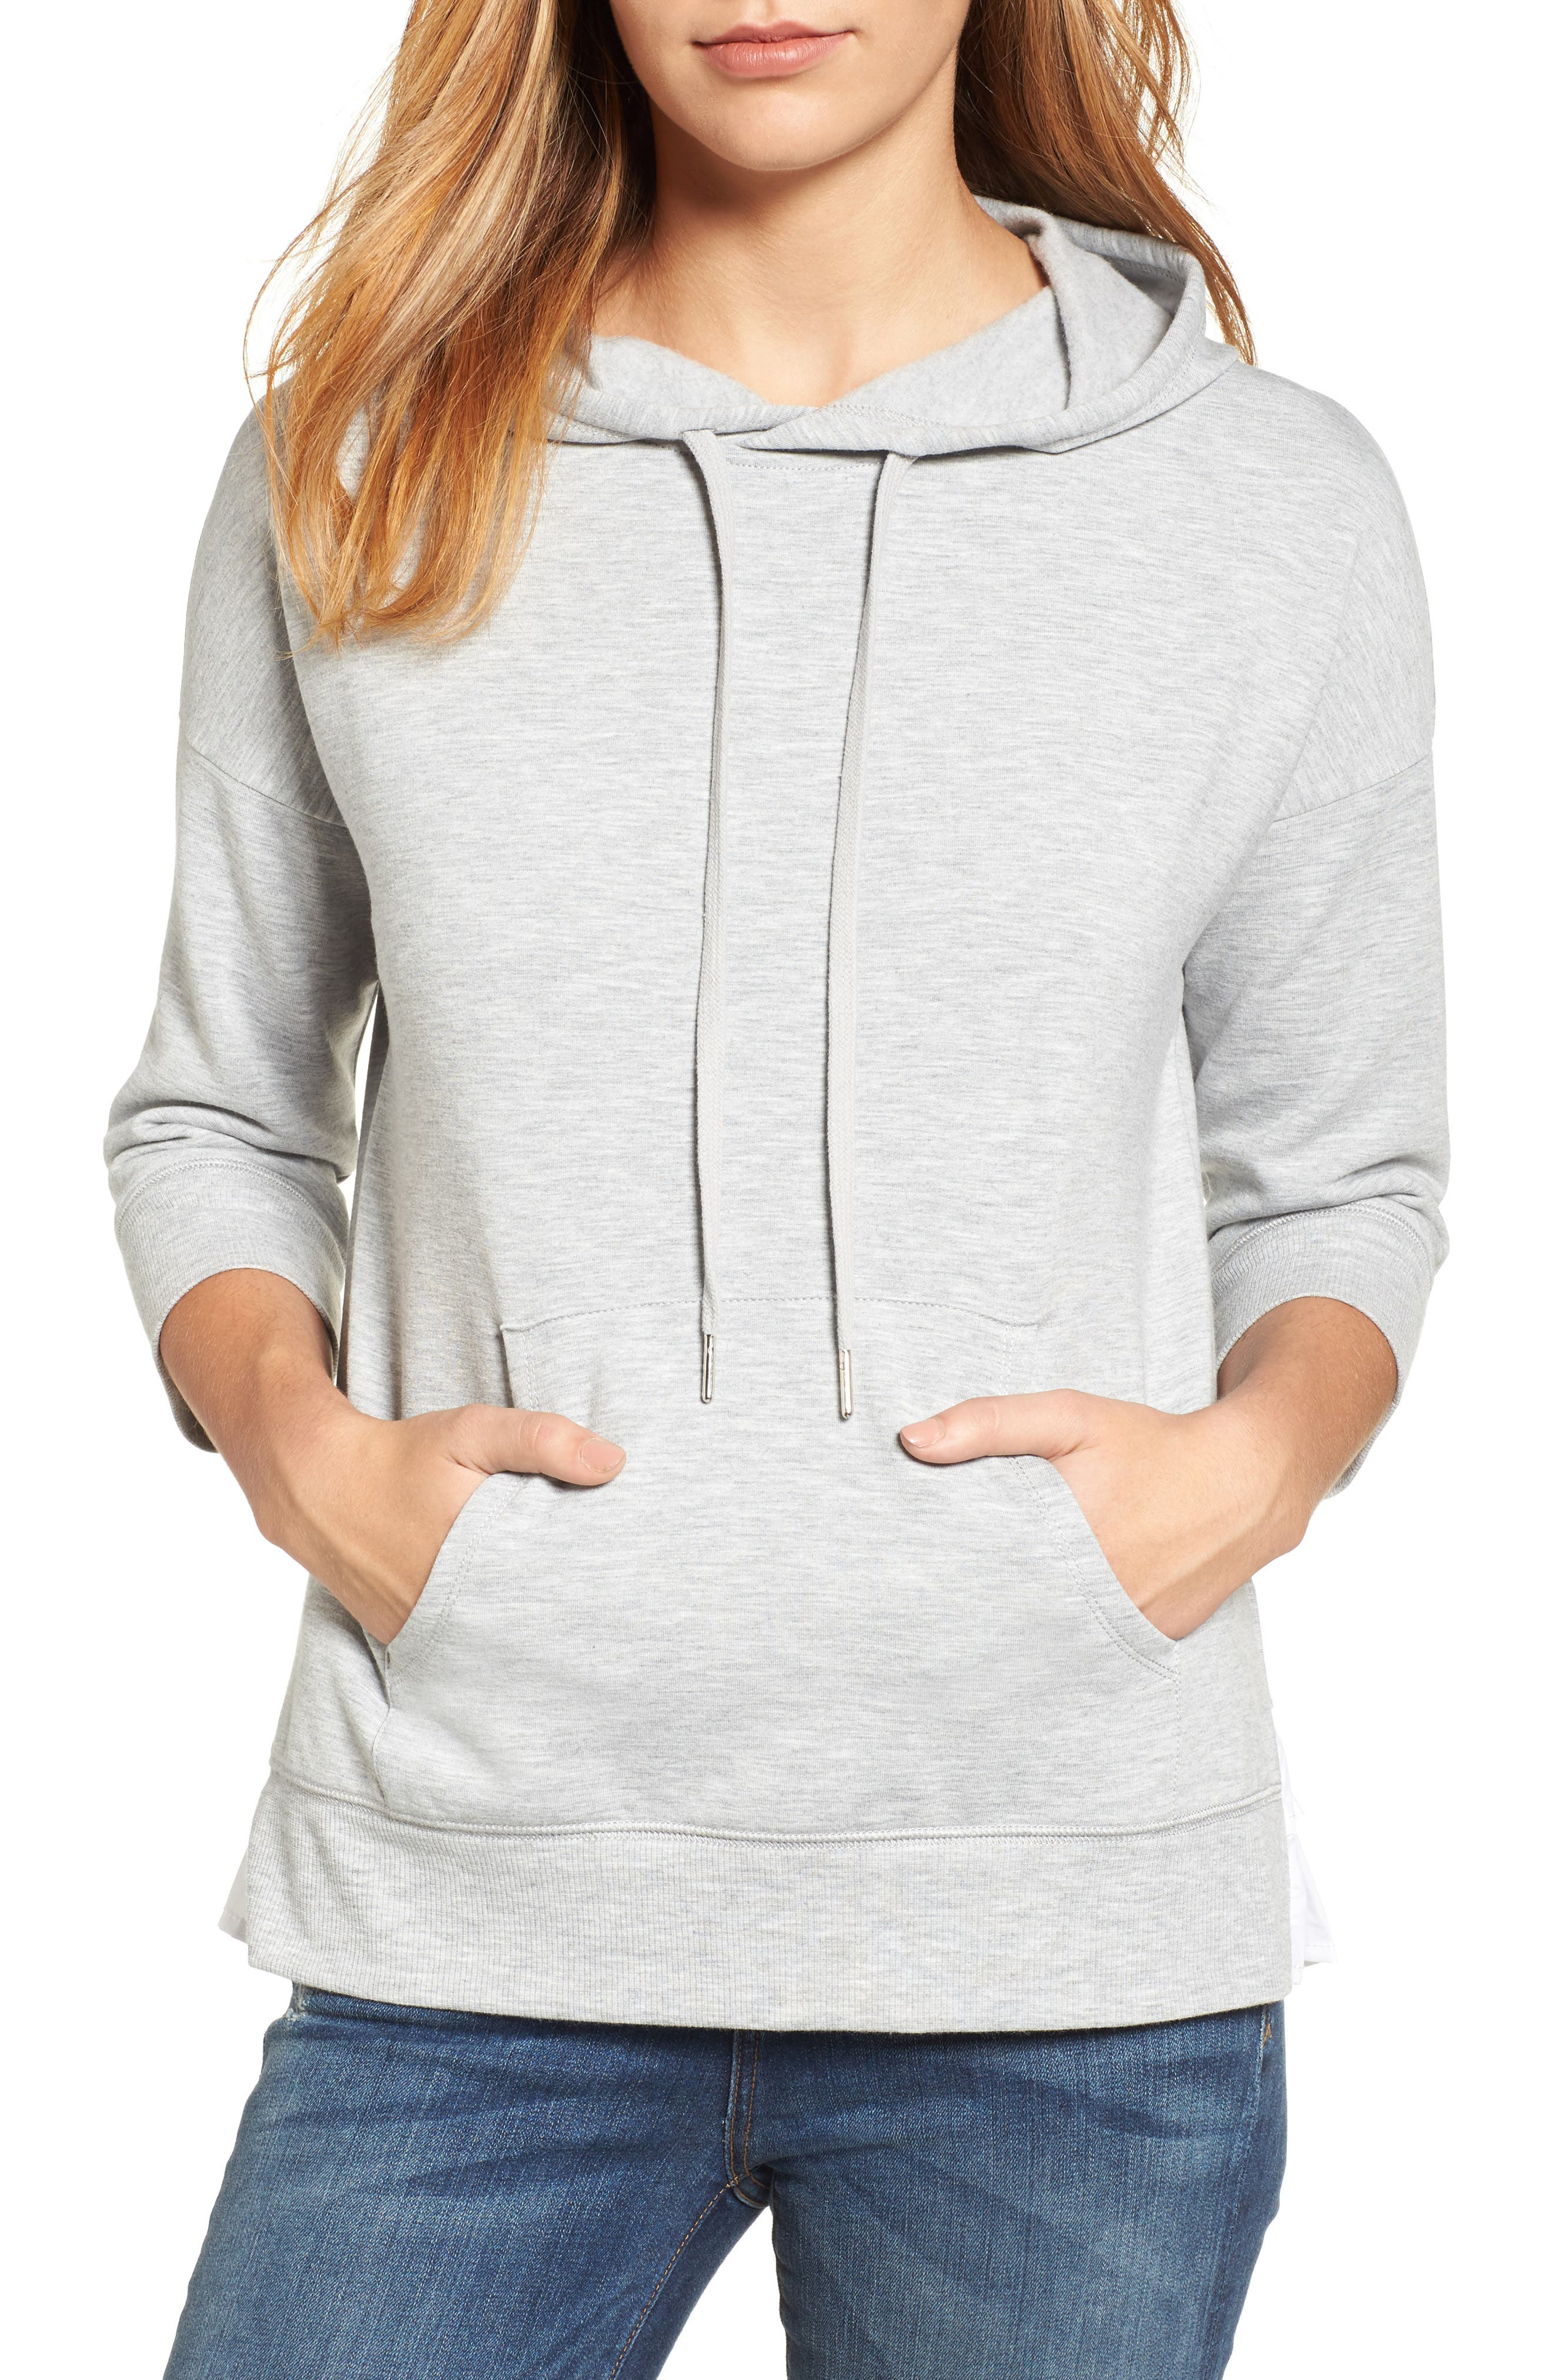 Main Image - Caslon® Woven Inset Knit Hoodie (Regular & Petite)